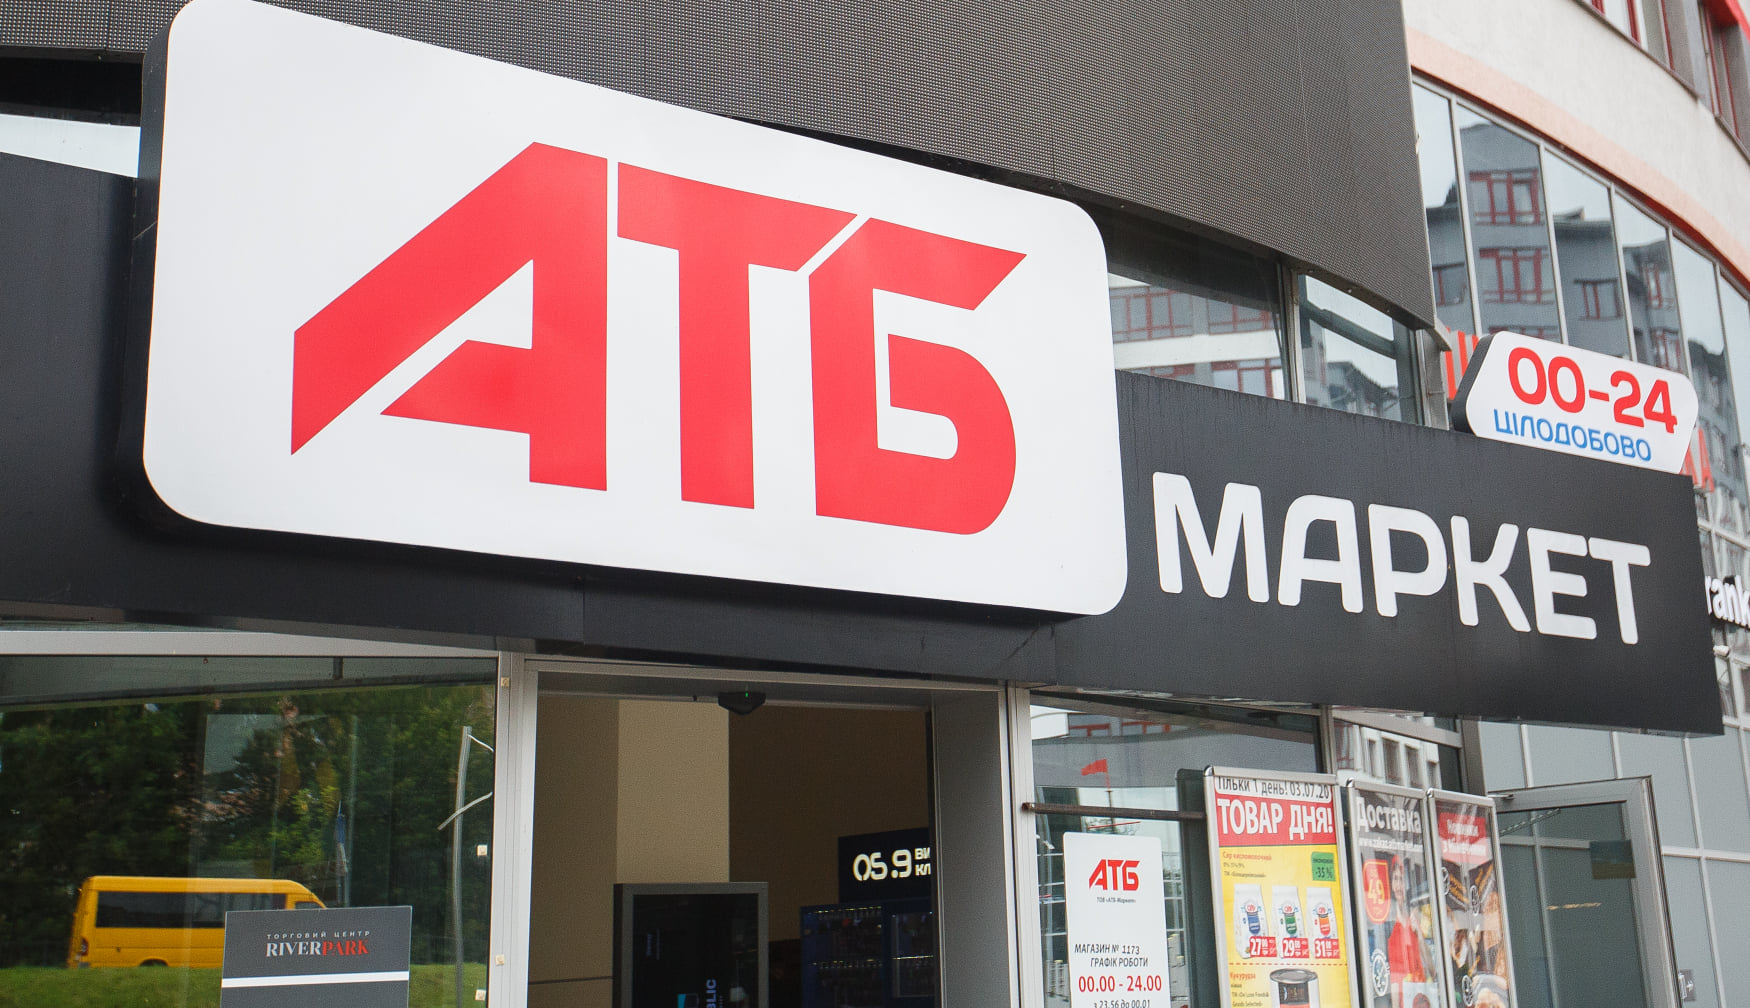 COVID-19 не завадив: АТБ за рік заробив 150 млрд грн - супермаркет, магазин, COVID-19 - 106658531 698710750918920 7182566235179379385 o